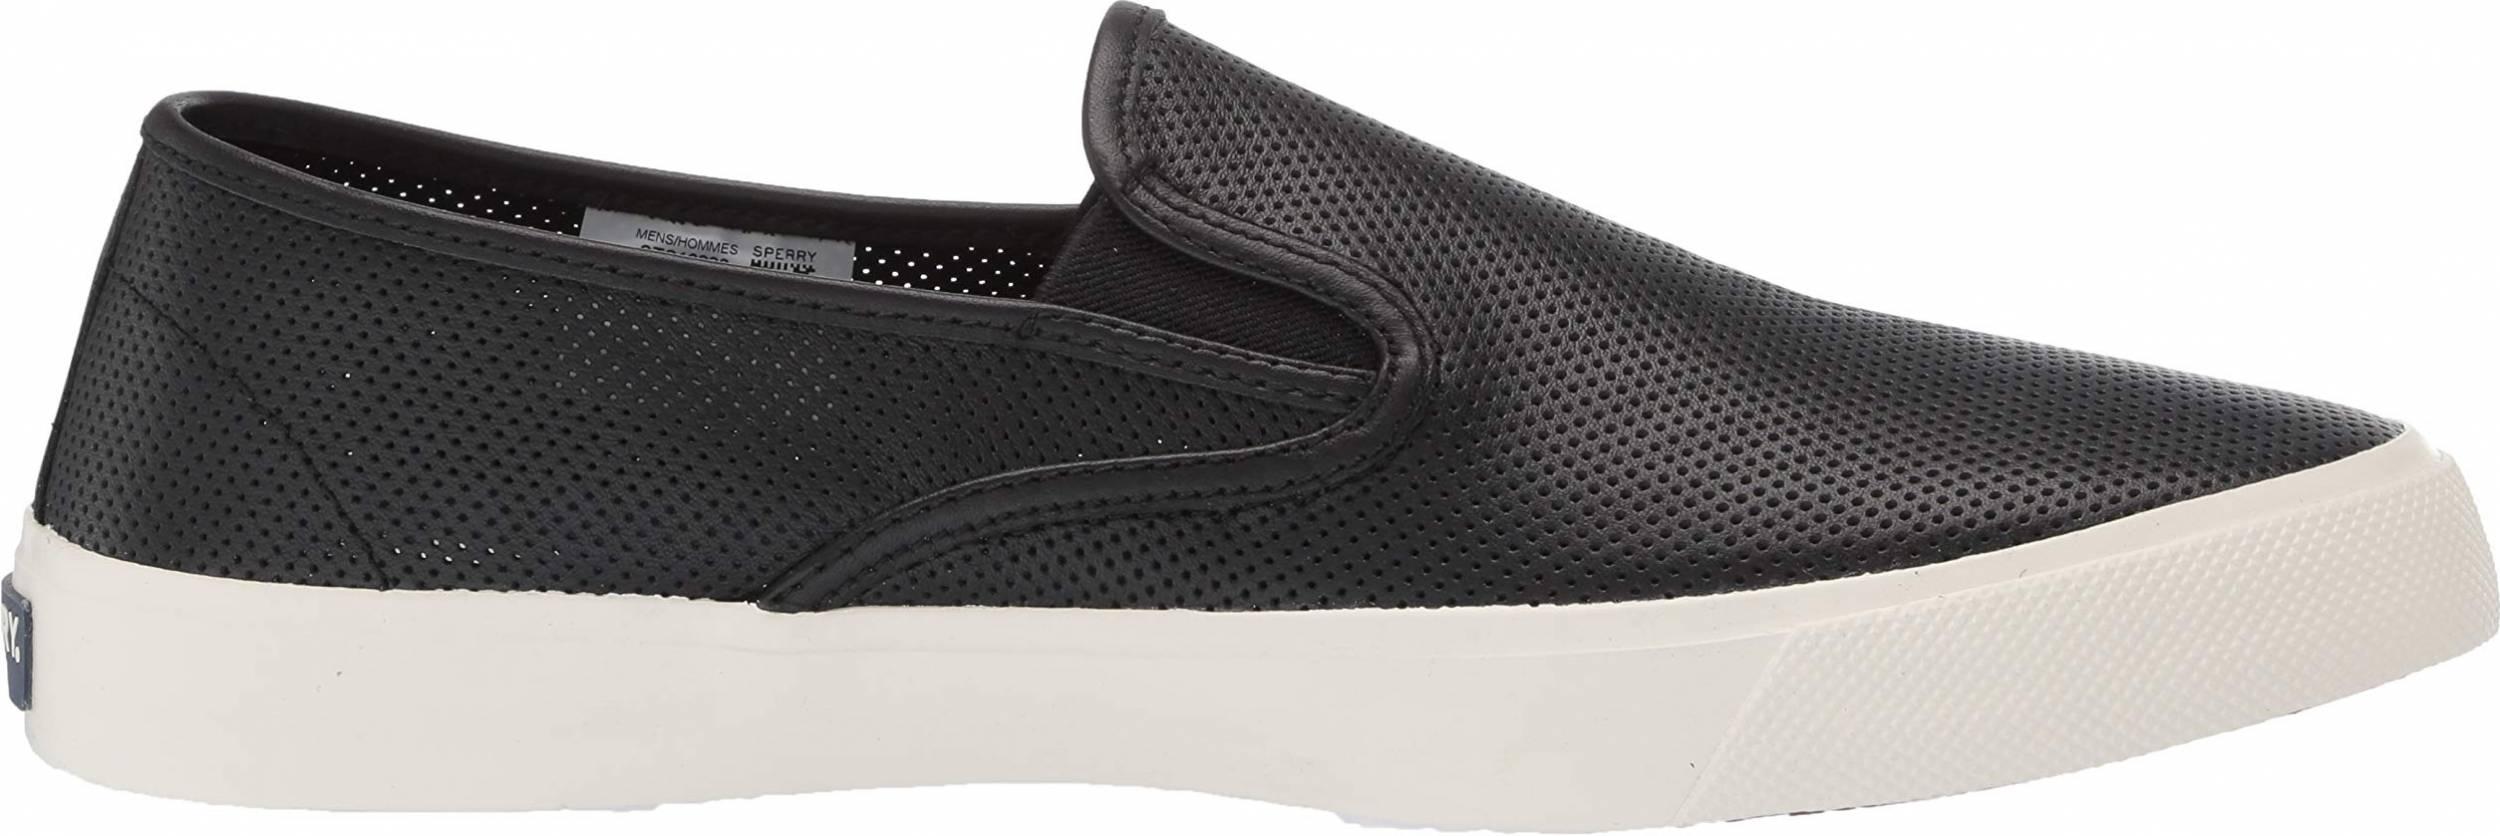 Slip On Perforated Sneaker